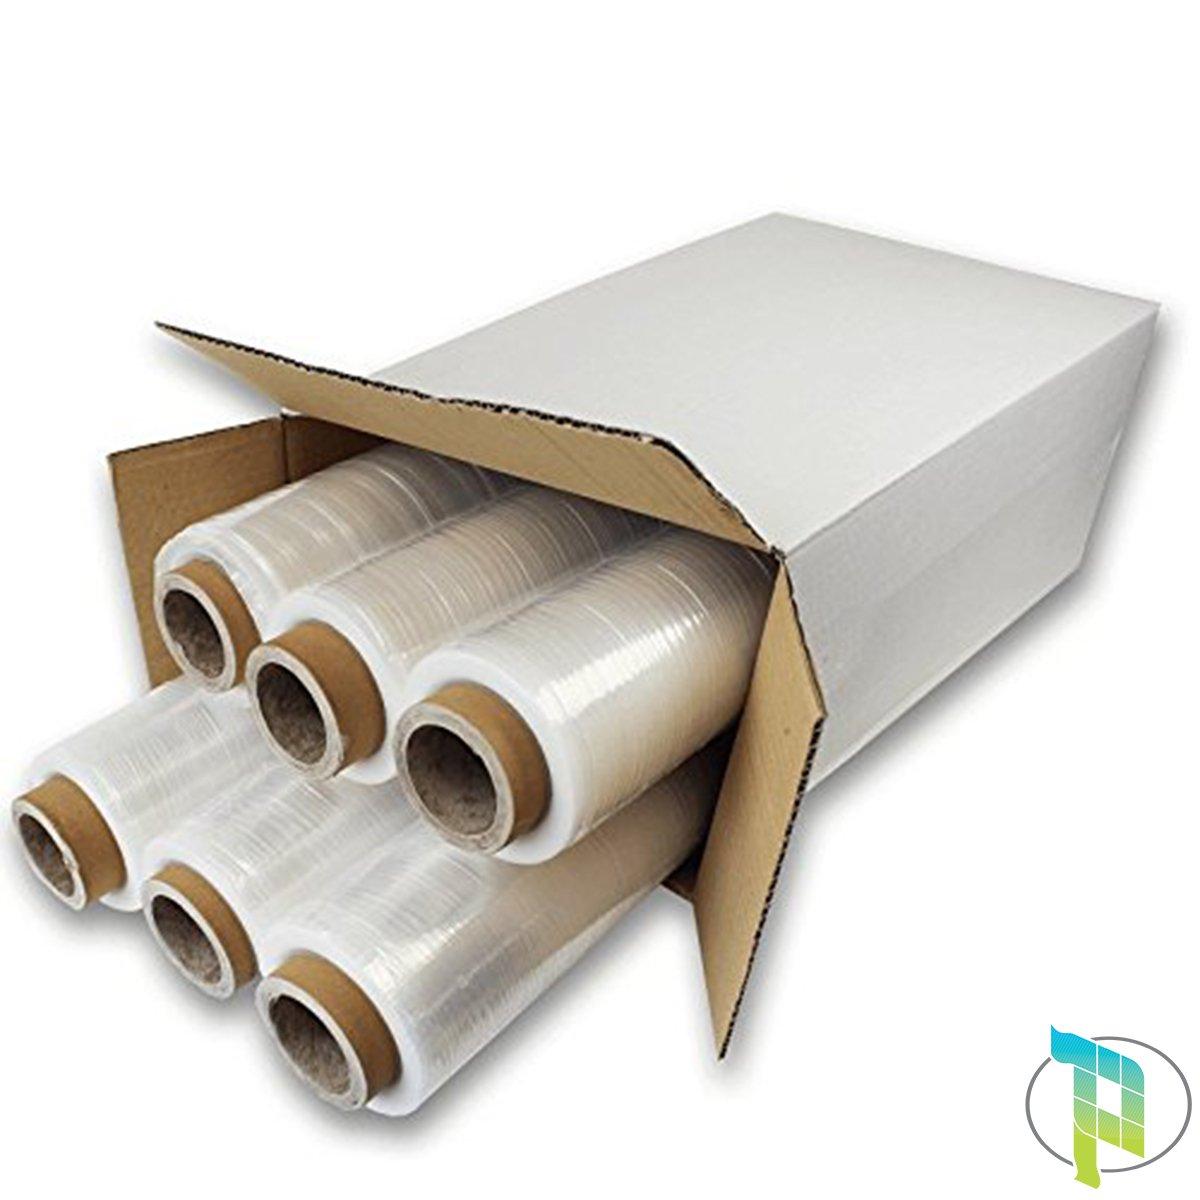 Palucart® Pellicola Film estensibile manuale x6, trasparente, spessore 23 my, 2,2Kg, altezza 500 mm Palucart®